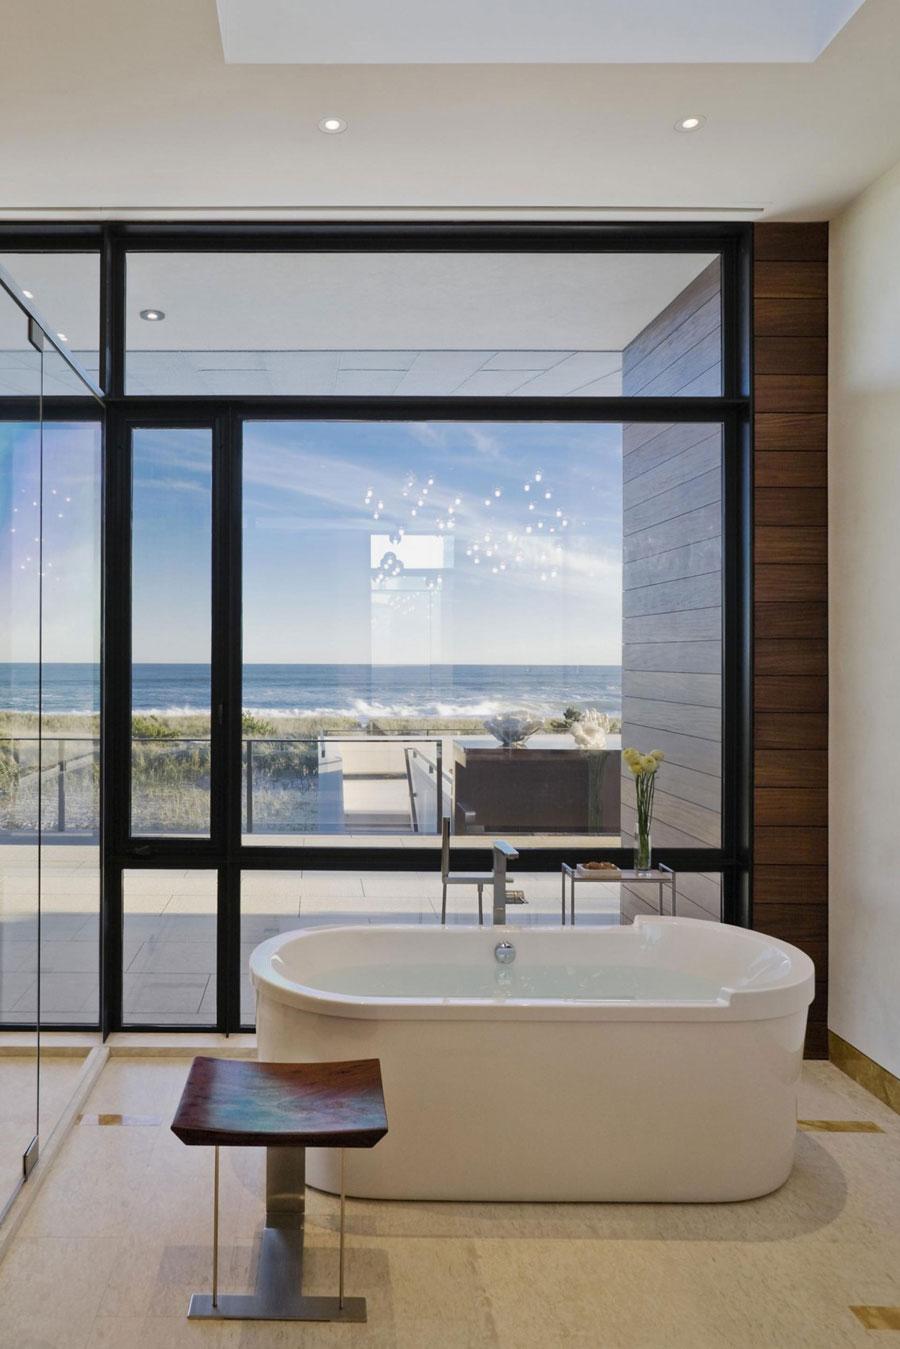 5 En arkitektonisk underverk av ett modernt hem designat av Alexander Gorlin Architects